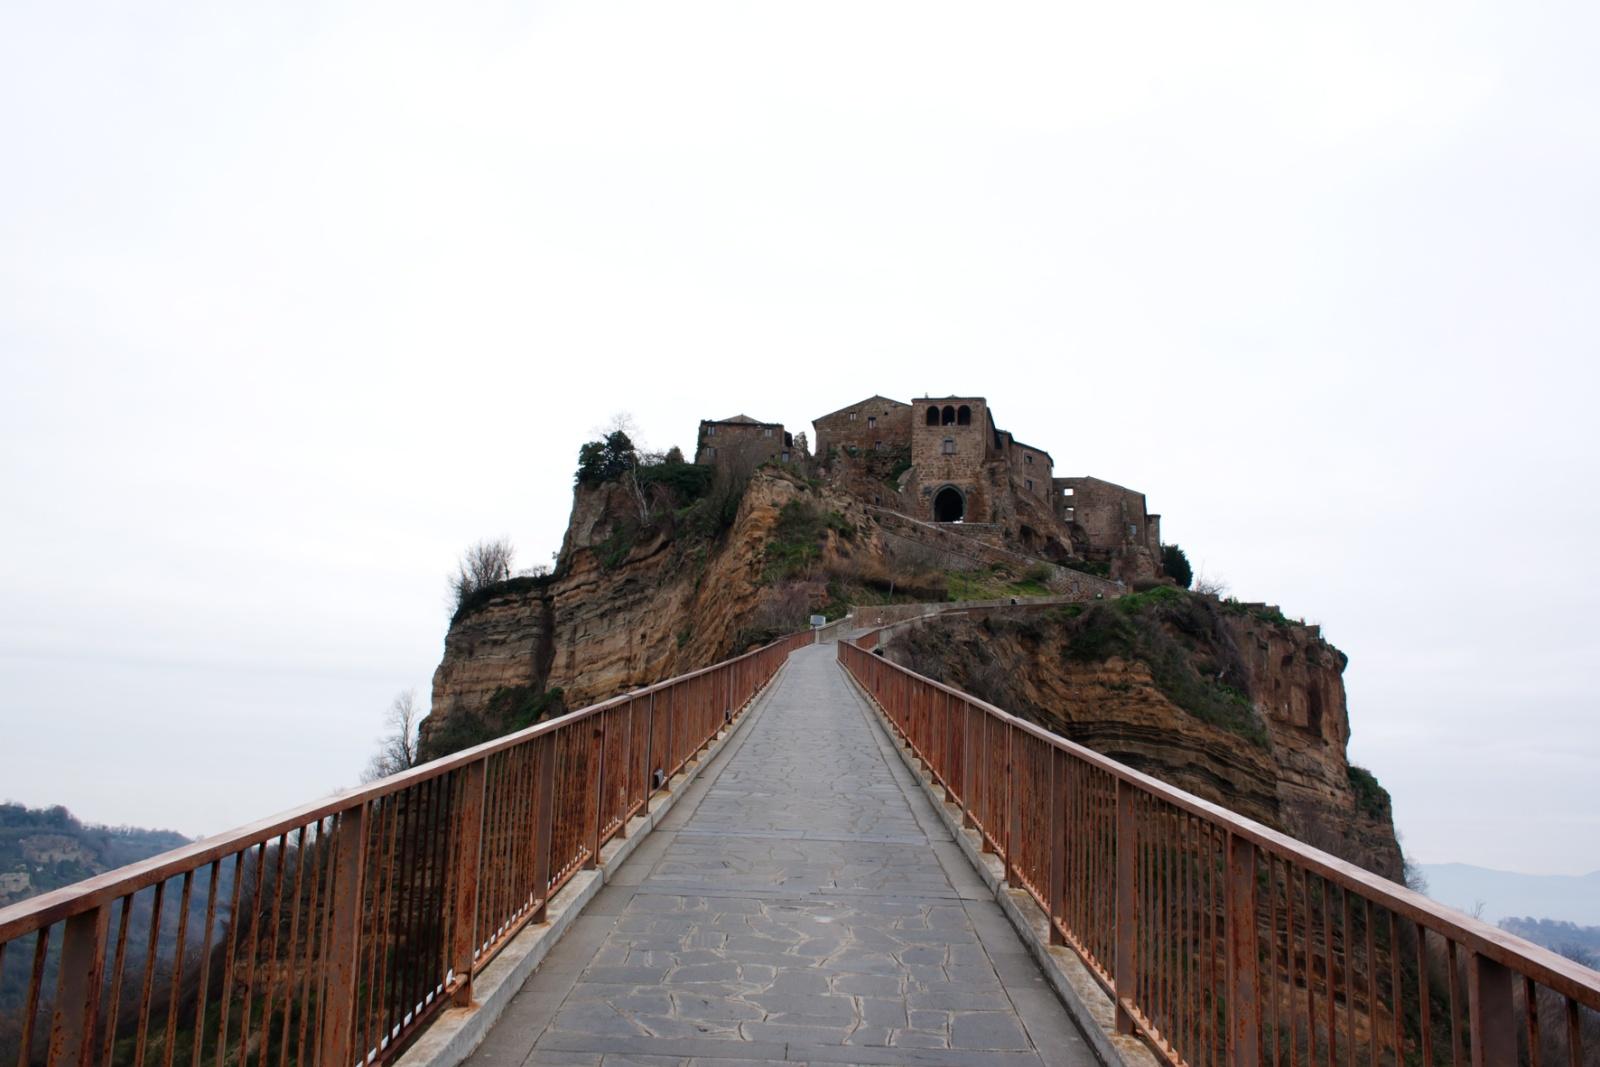 Civita-Di-Bagnoregio - Ingresso al paese di civita di bagnoregio,ingresso che può essere percorso esclusivamente a piedi.